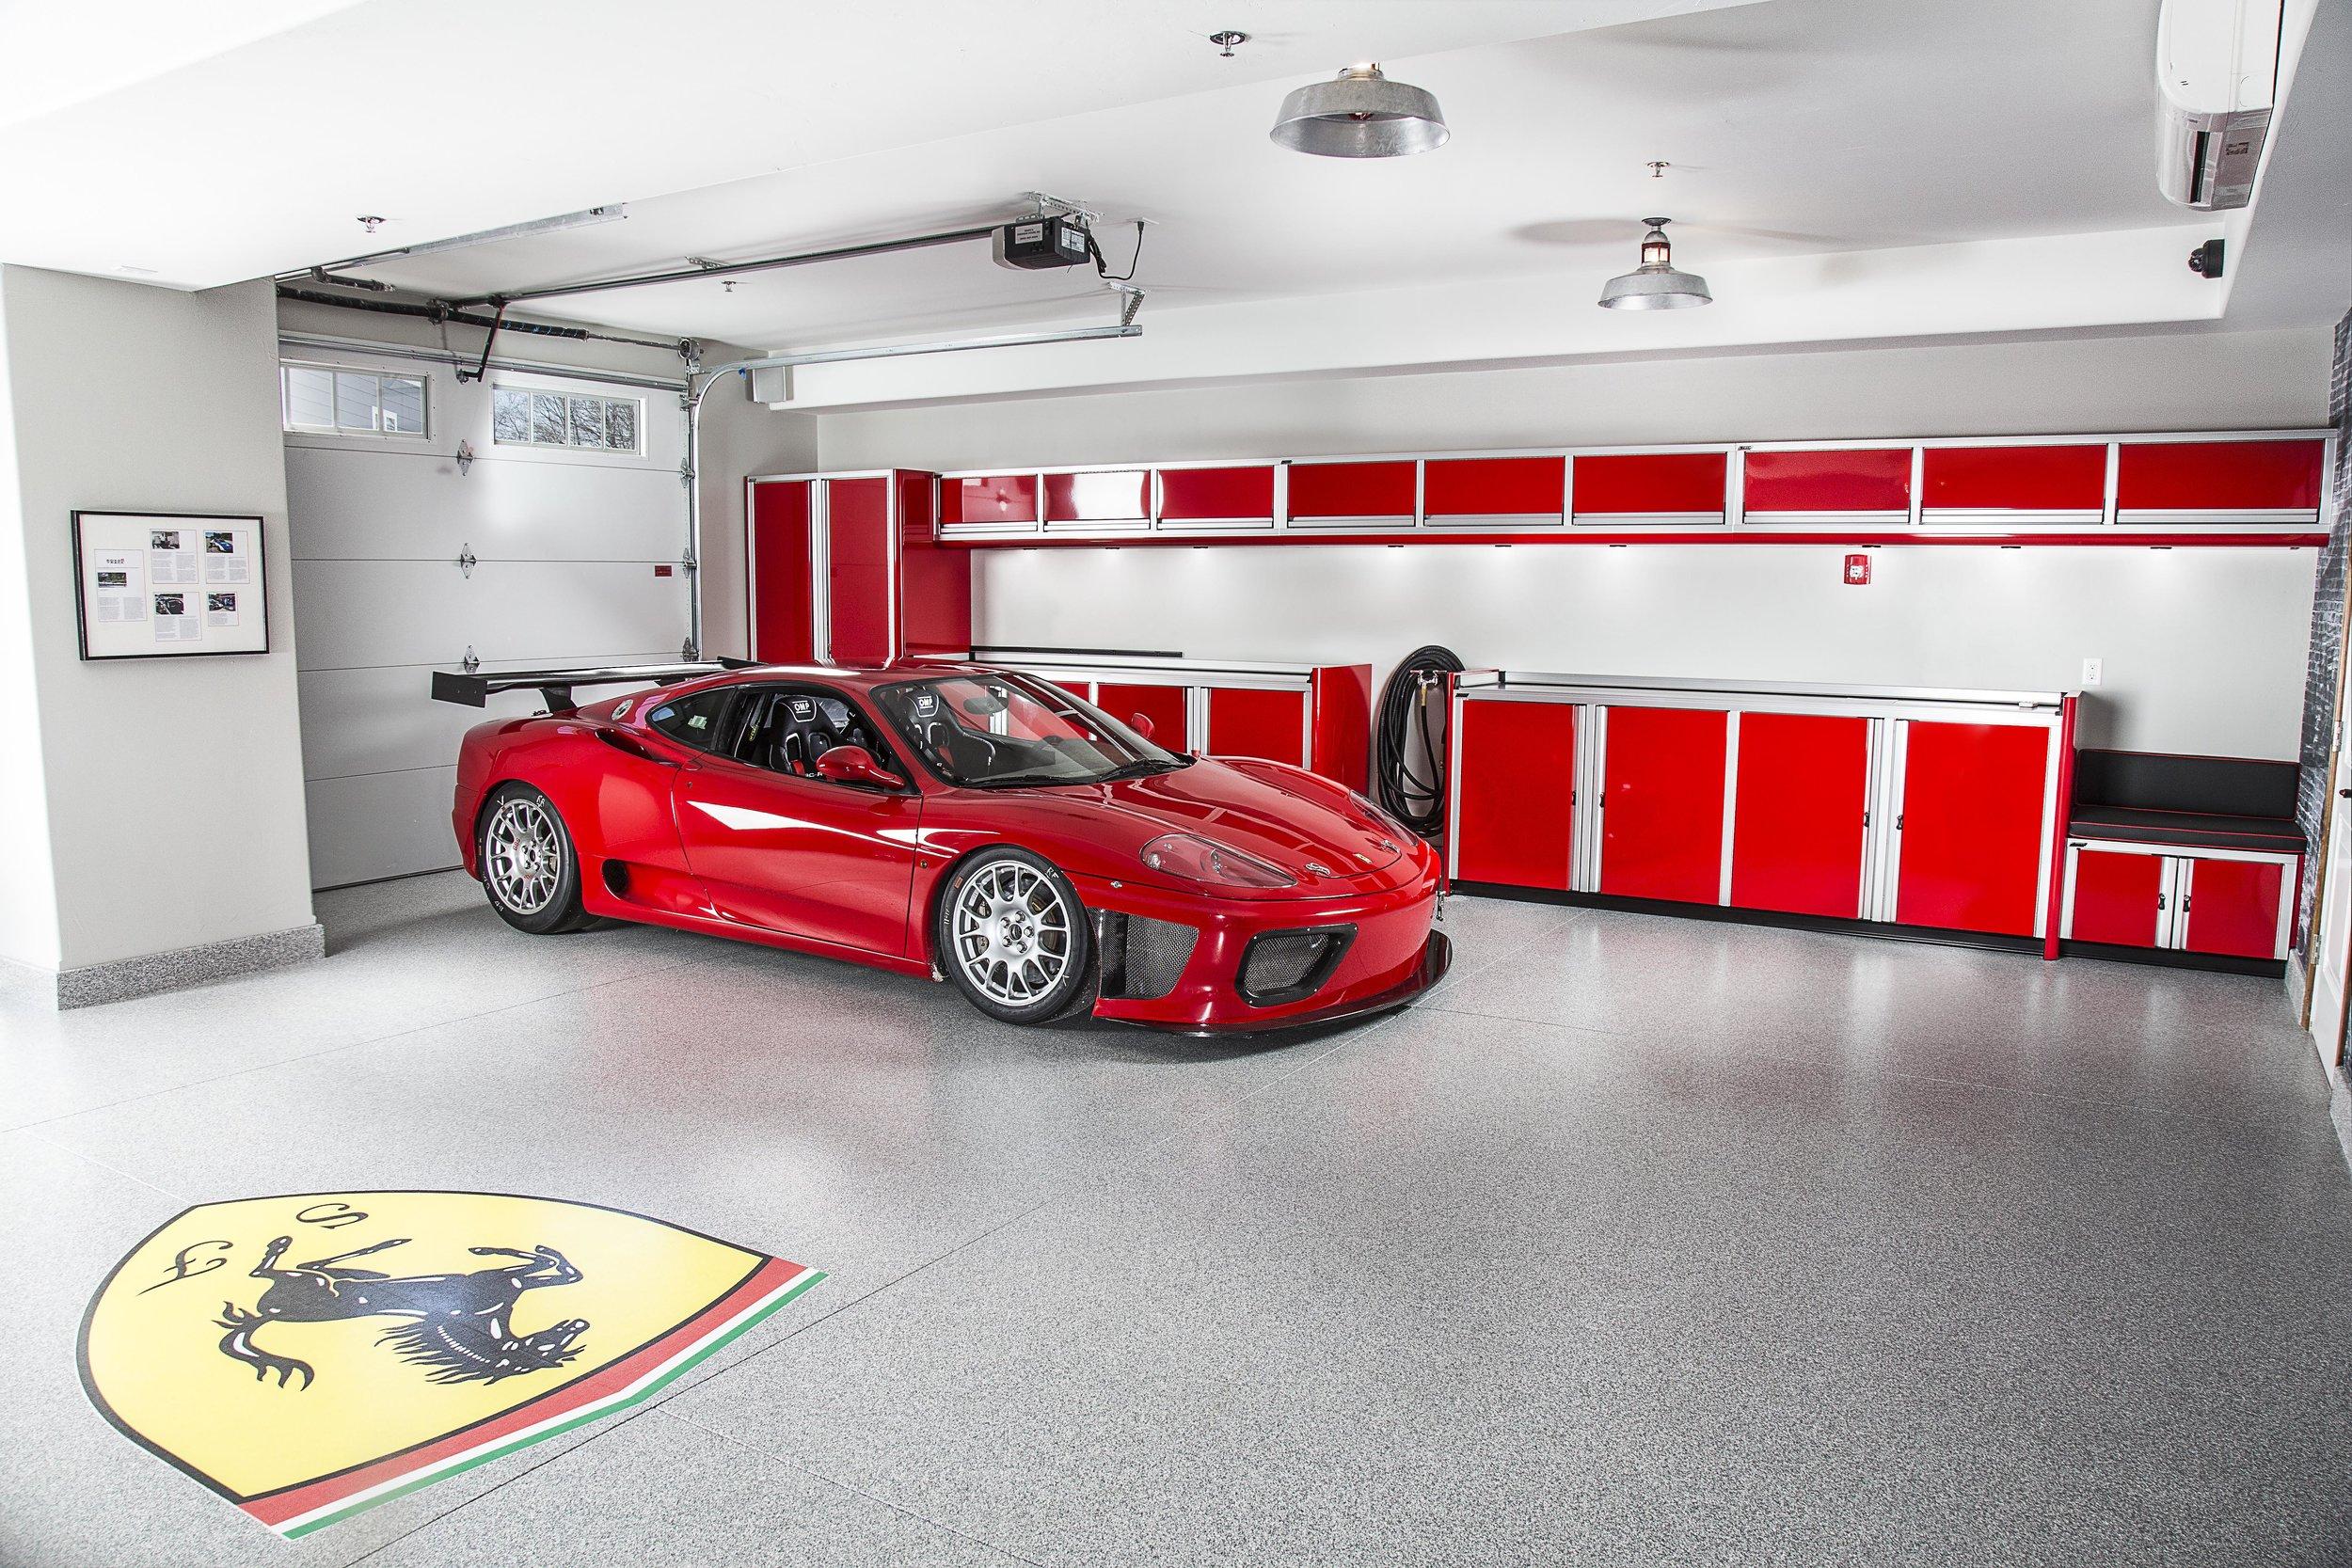 Ferrari+Garage+1.jpg